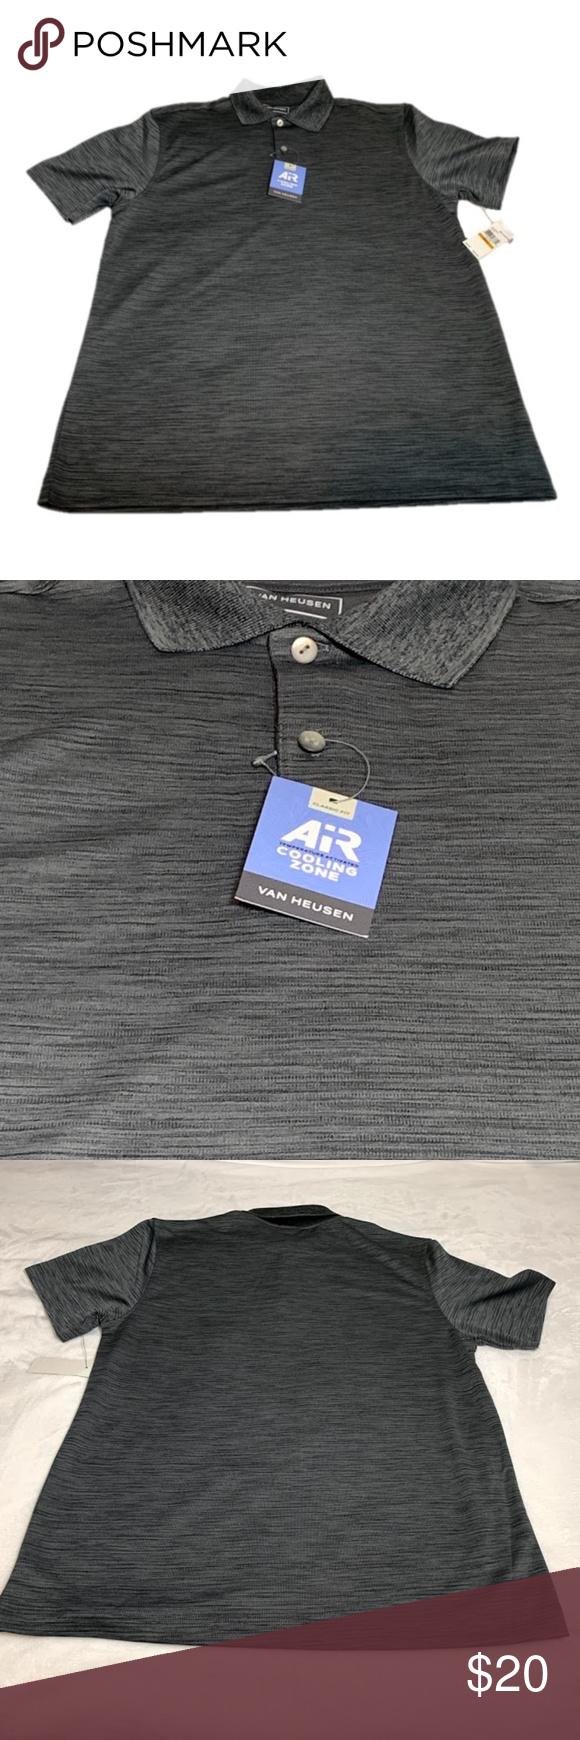 Van Heusen Air Temperature Activated Shirt S New Nwt Fashion Van Heusen Black Vans